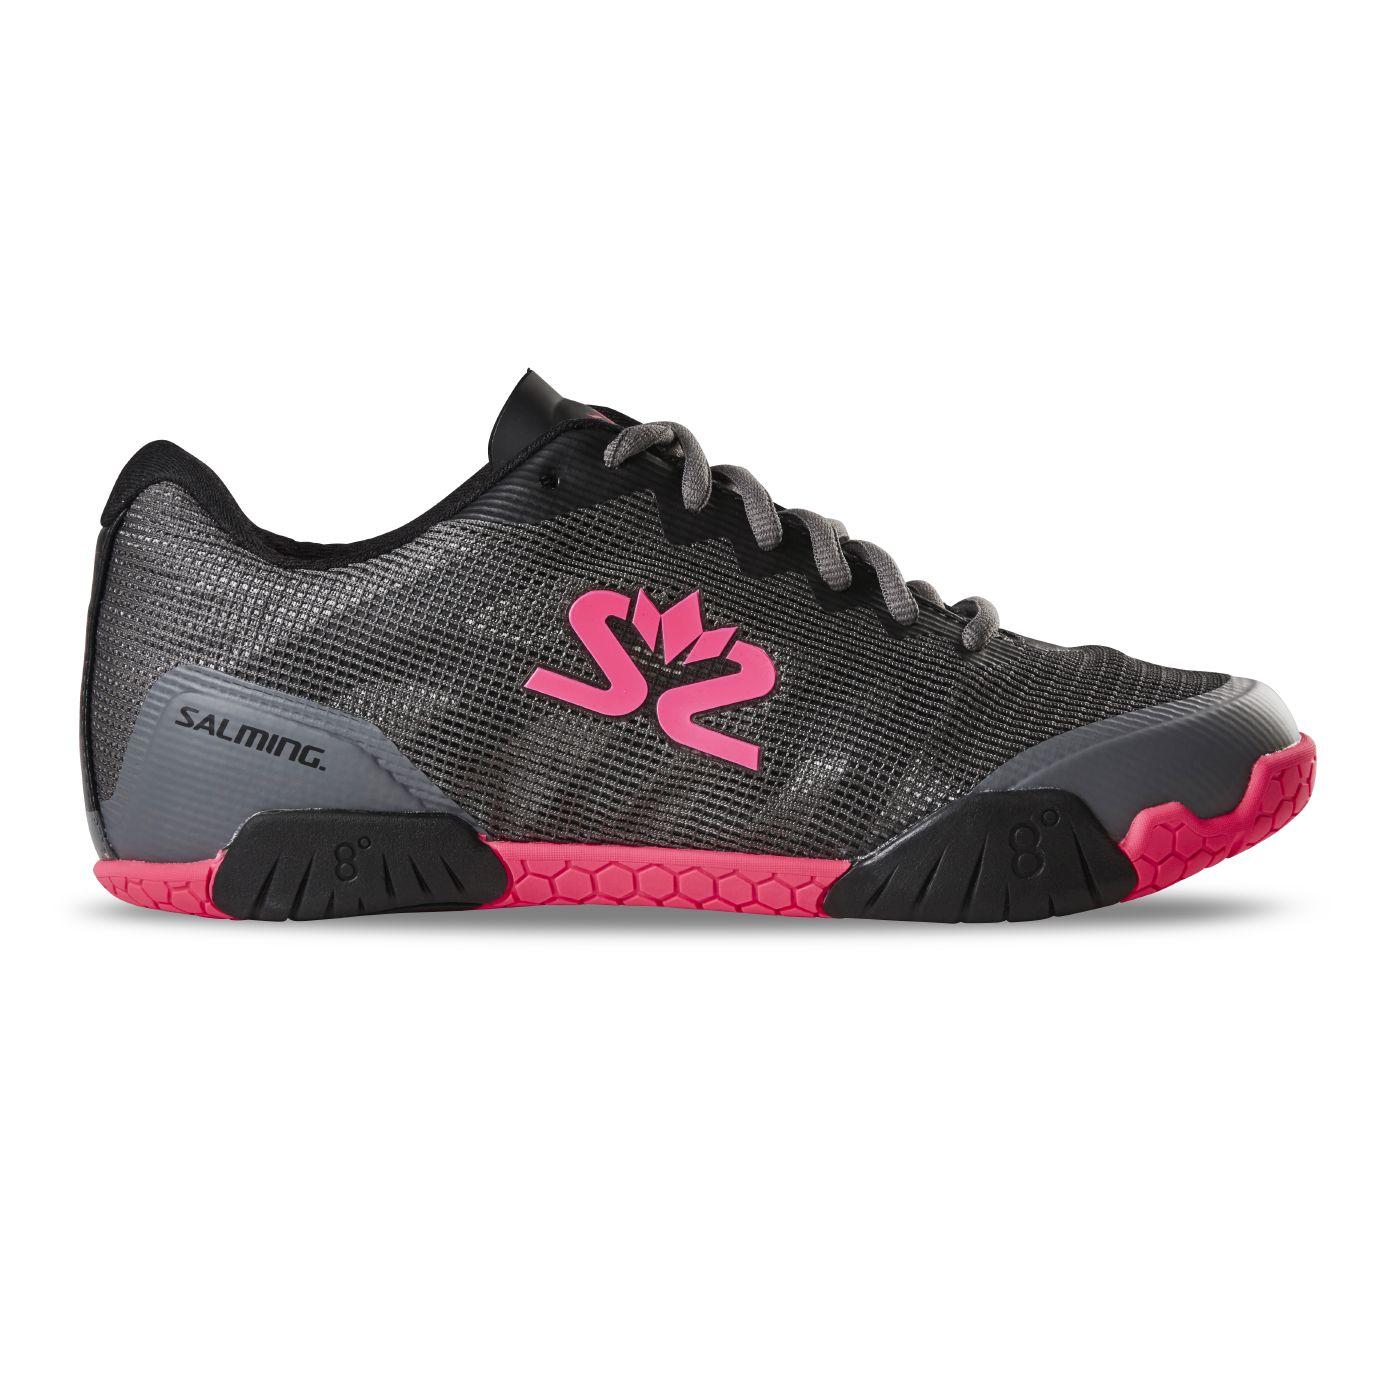 Salming Hawk Shoe Women GunMetal/Pink 7 UK - 40 2/3 EUR - 26 cm